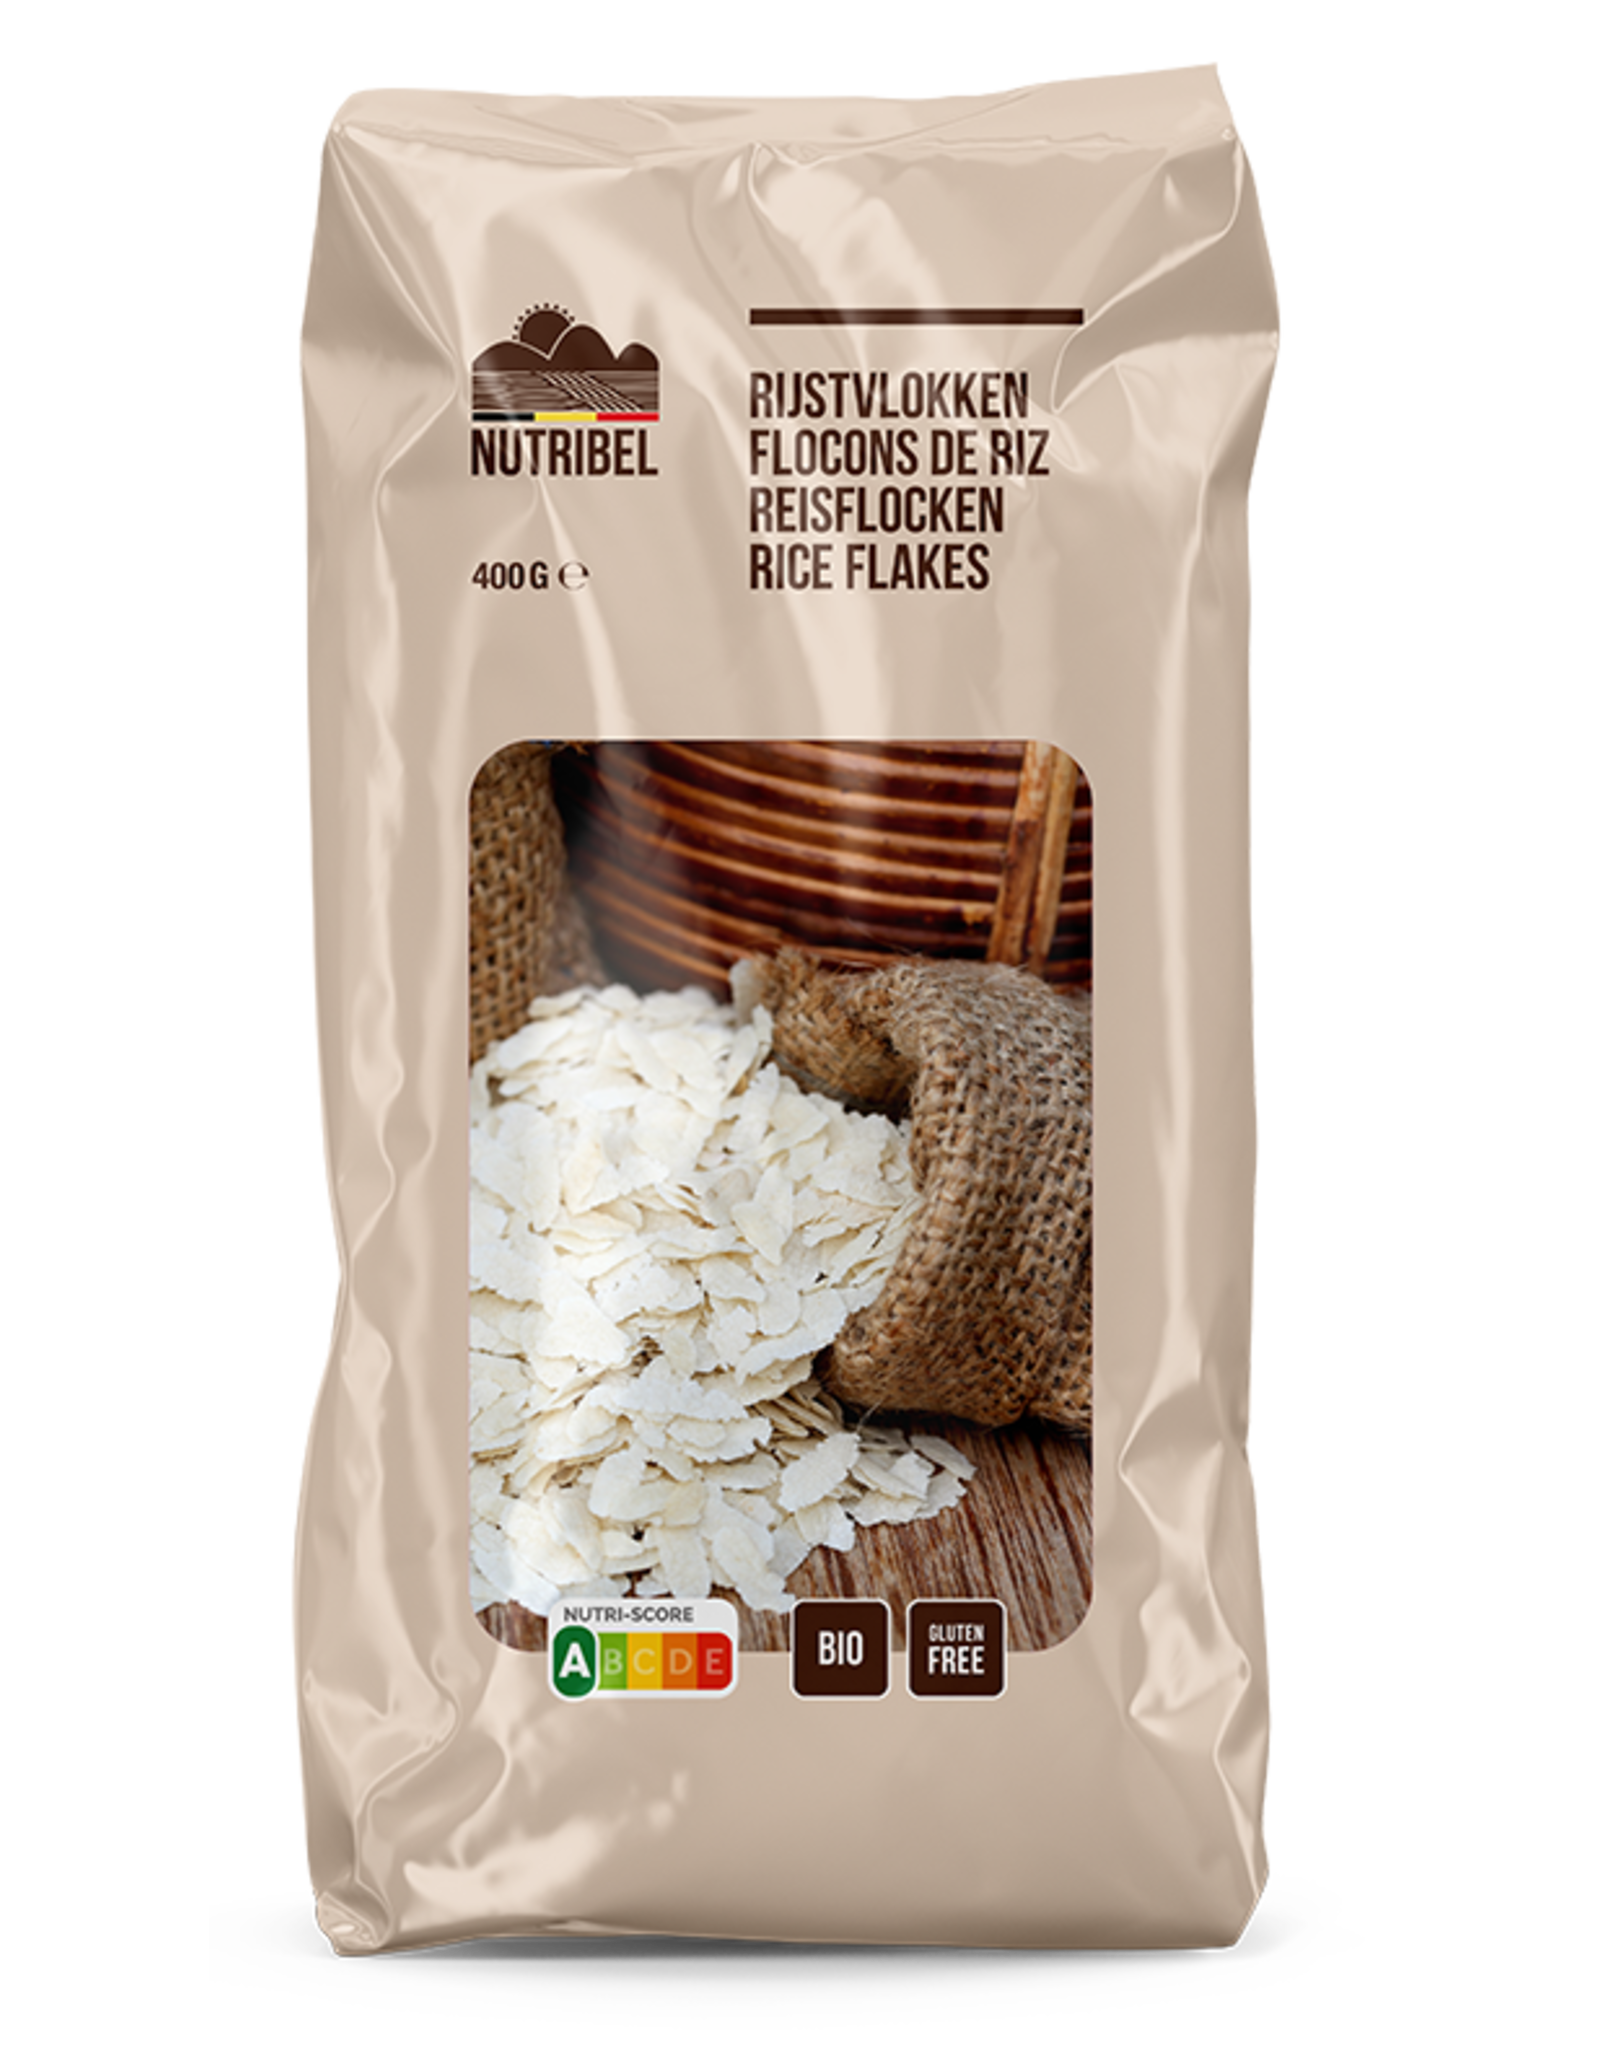 Nutribel Flocons de riz bio & sans gluten 400g